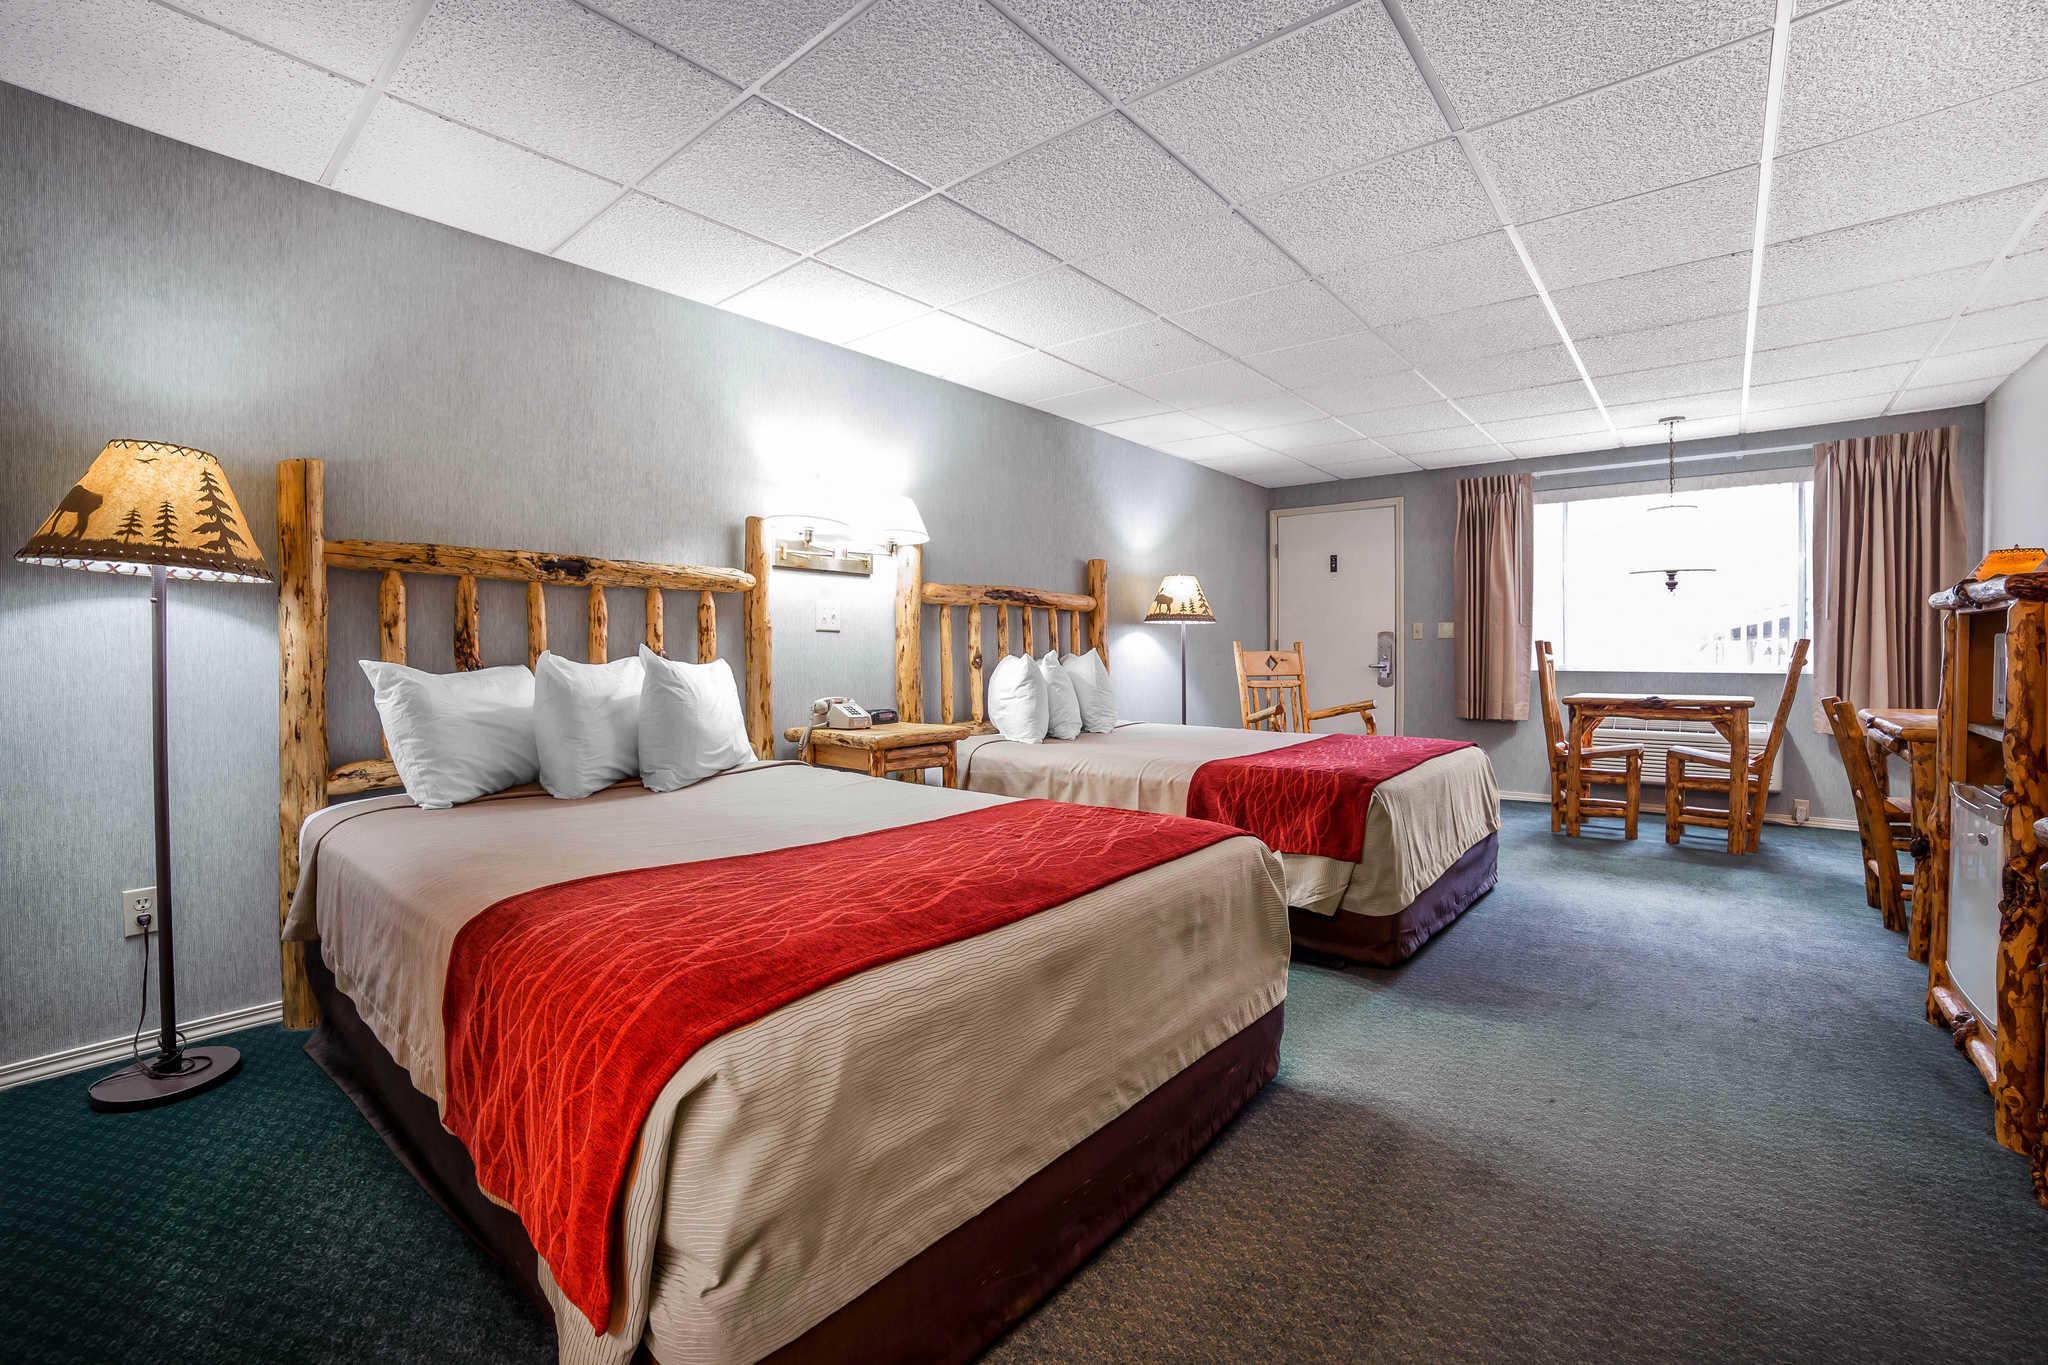 Rodeway Inn Pronghorn Lodge image 36